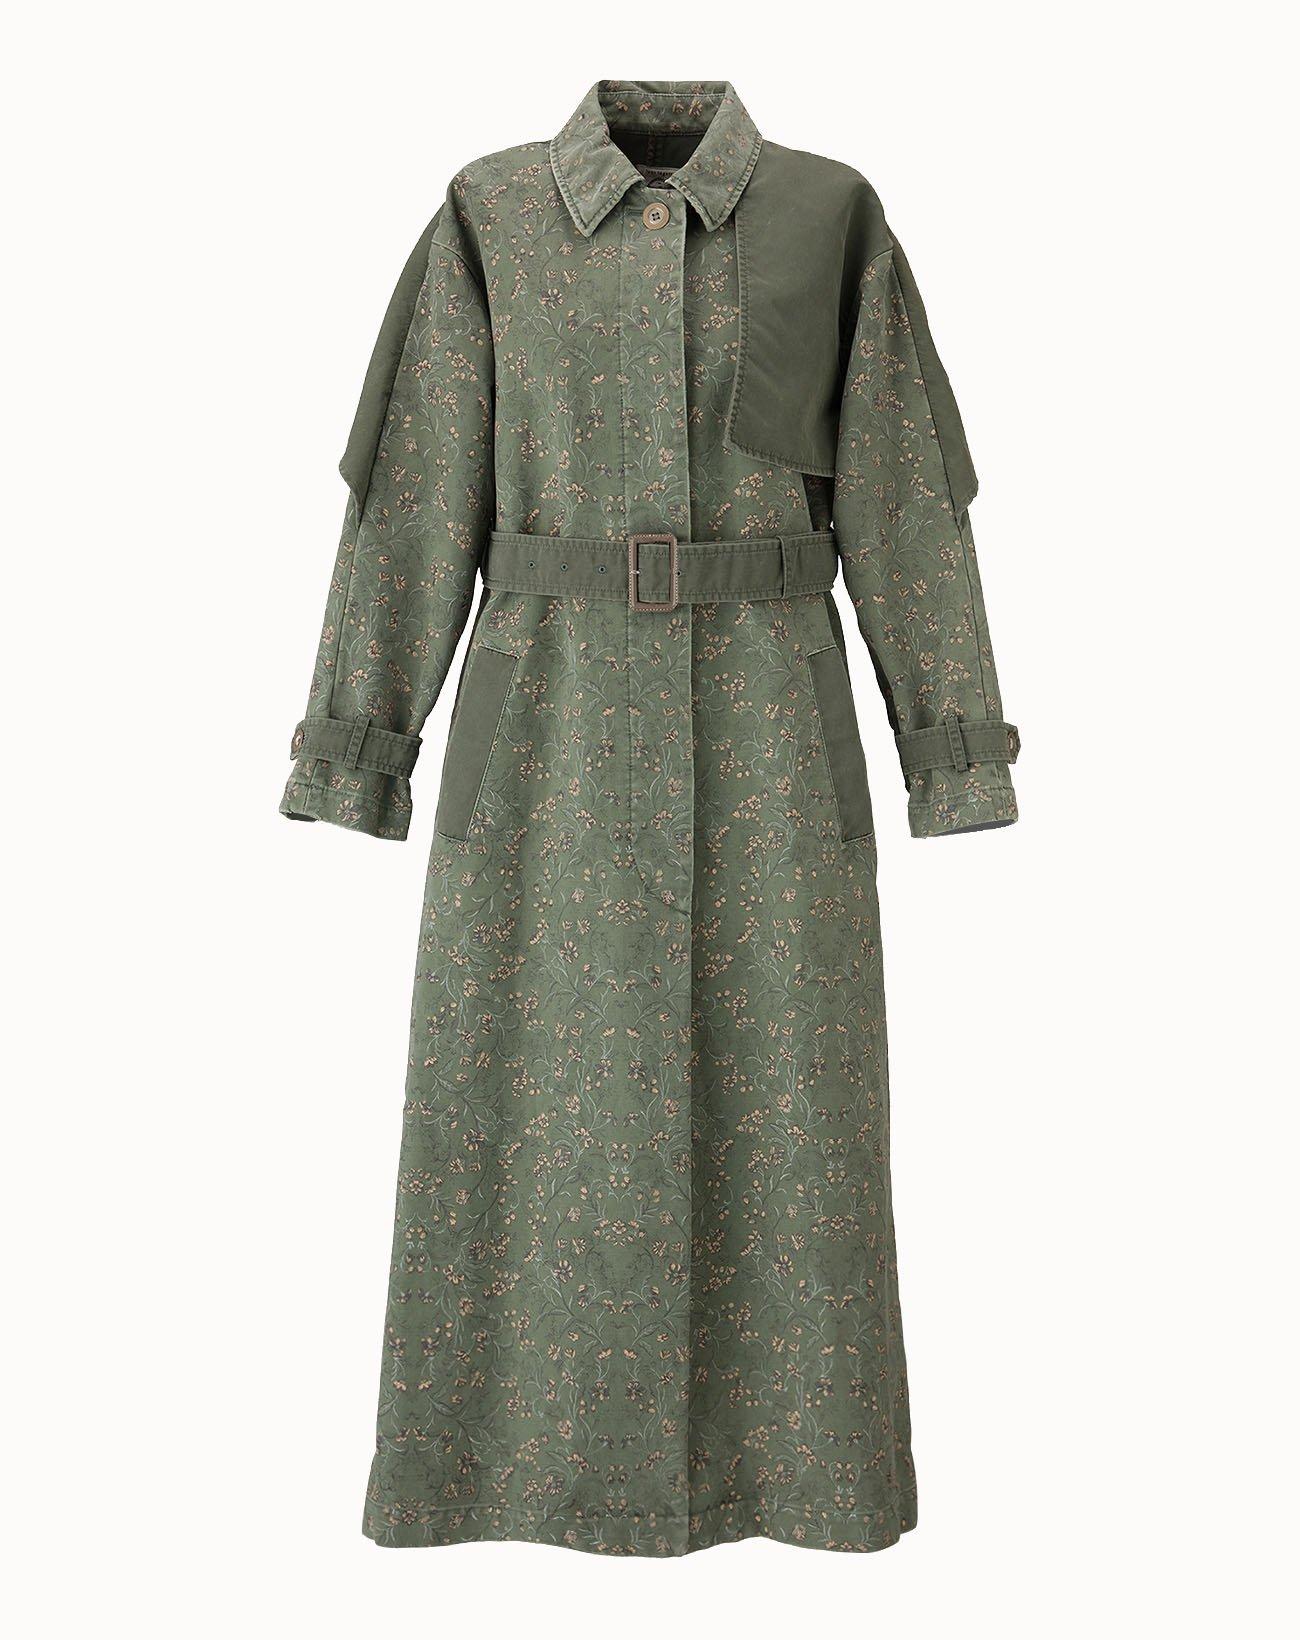 leur logette - Vintage Garden Printed Coat - Khaki